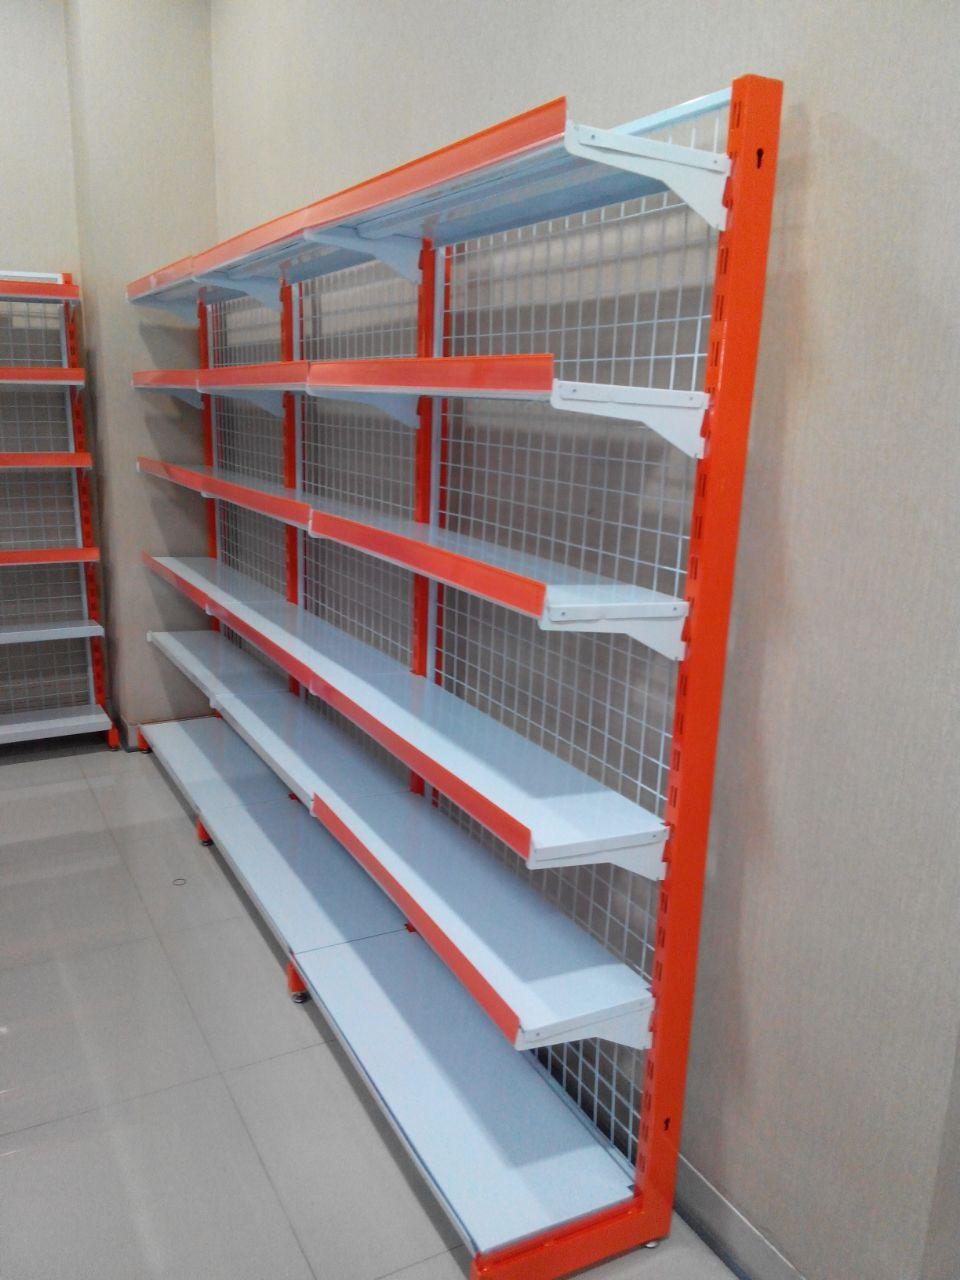 Rak Minimarket Bandung Murah Terbaik